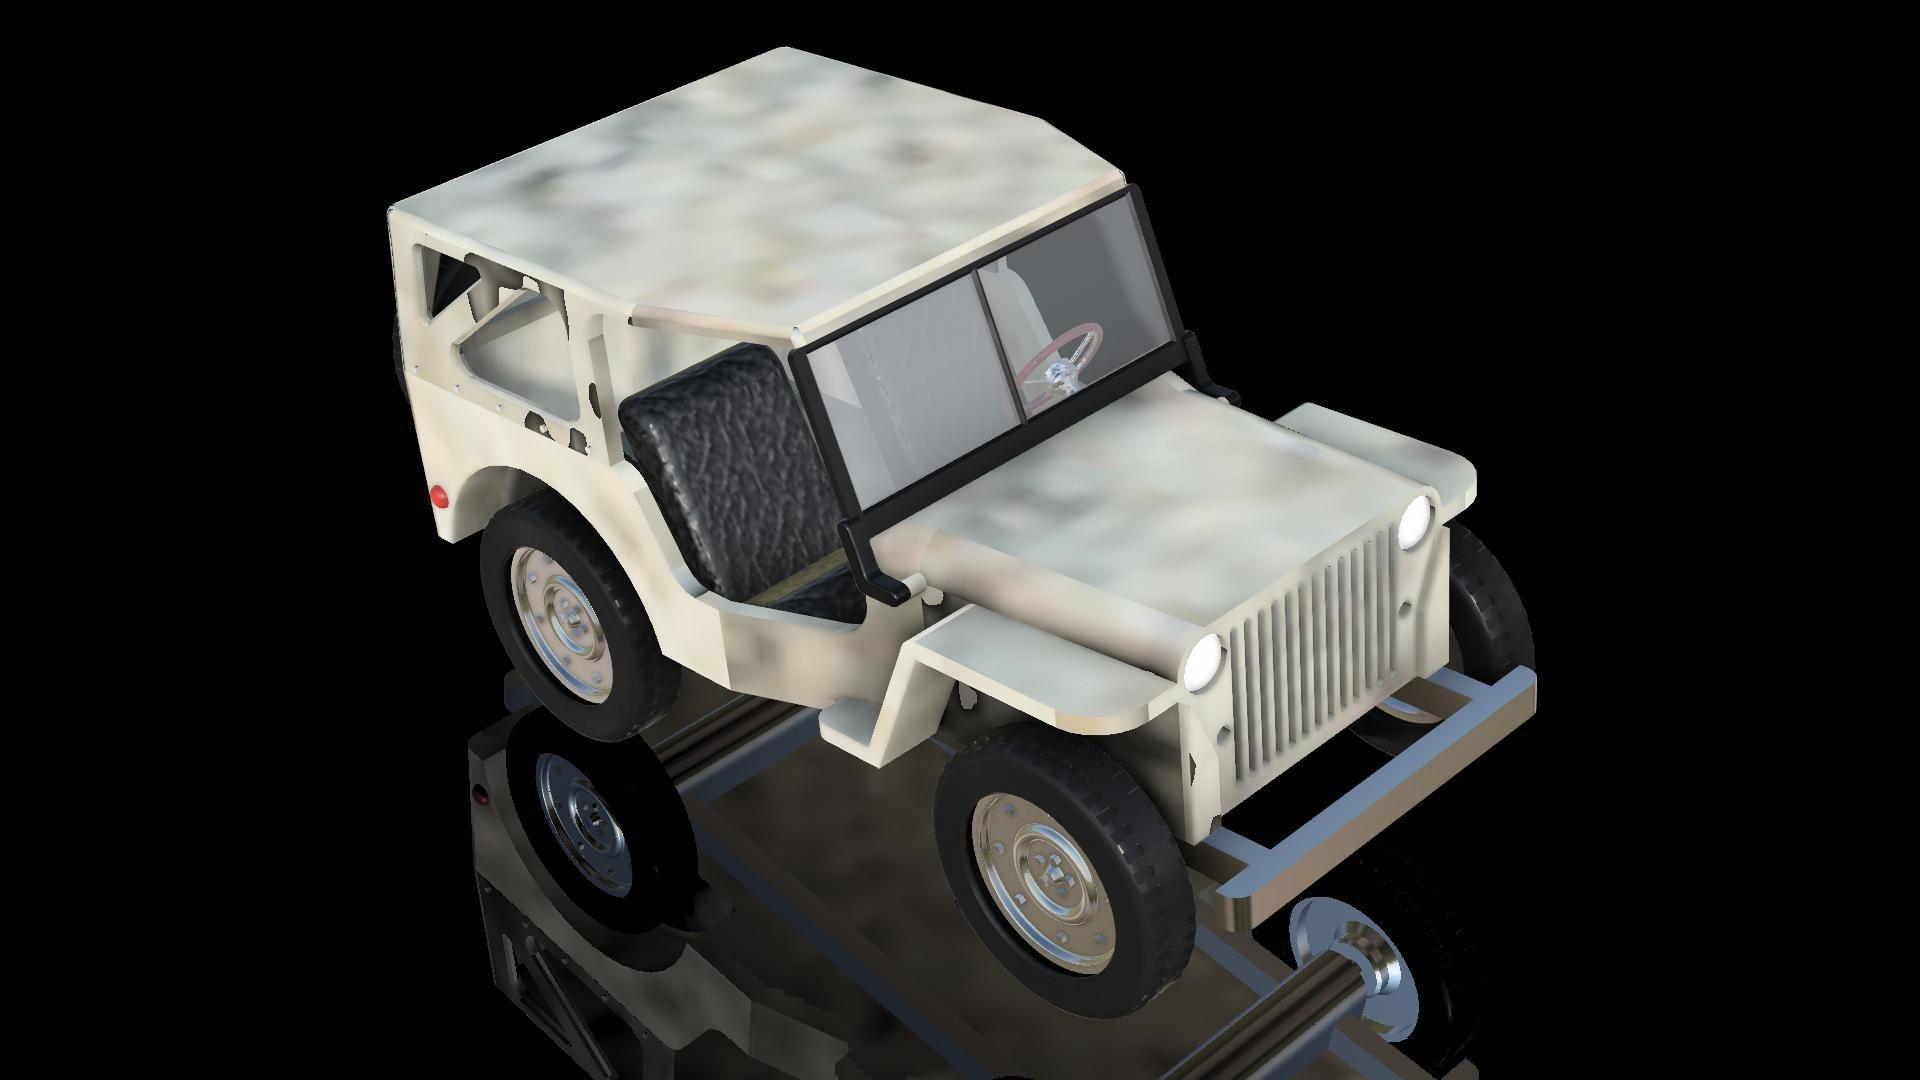 4-jeep-3500-3500